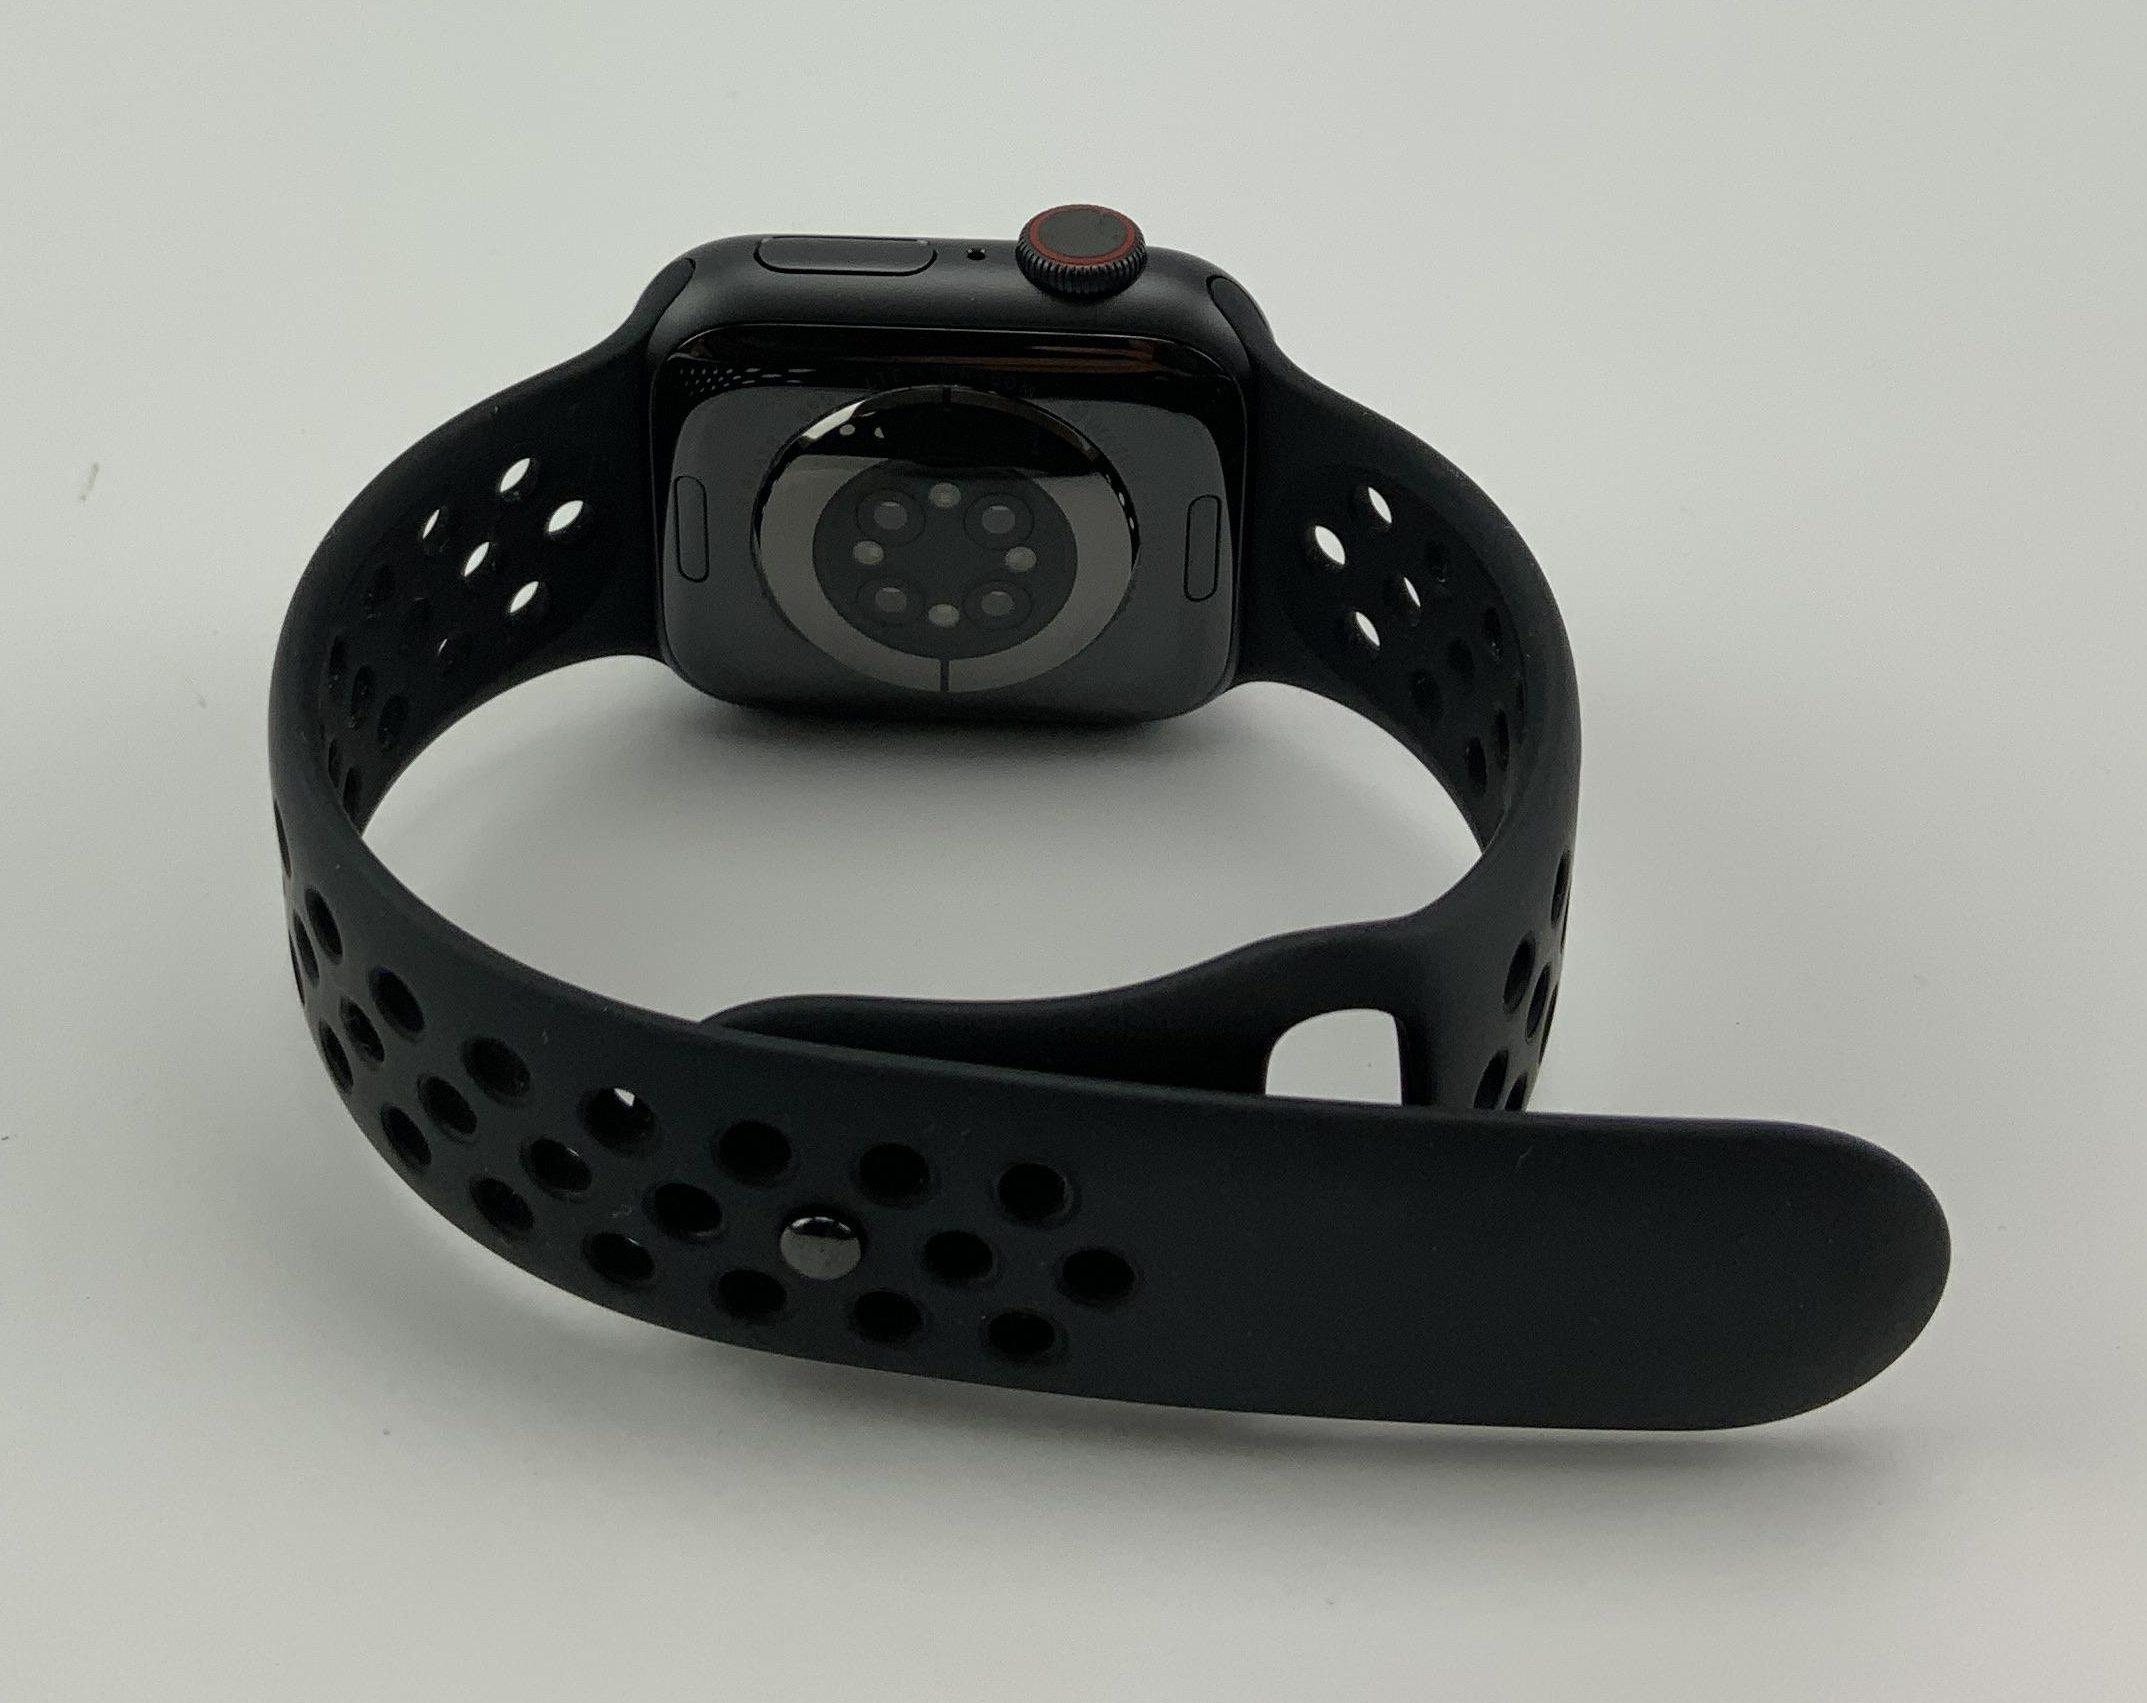 Watch Series 6 Steel Cellular (40mm), Space Black, obraz 2